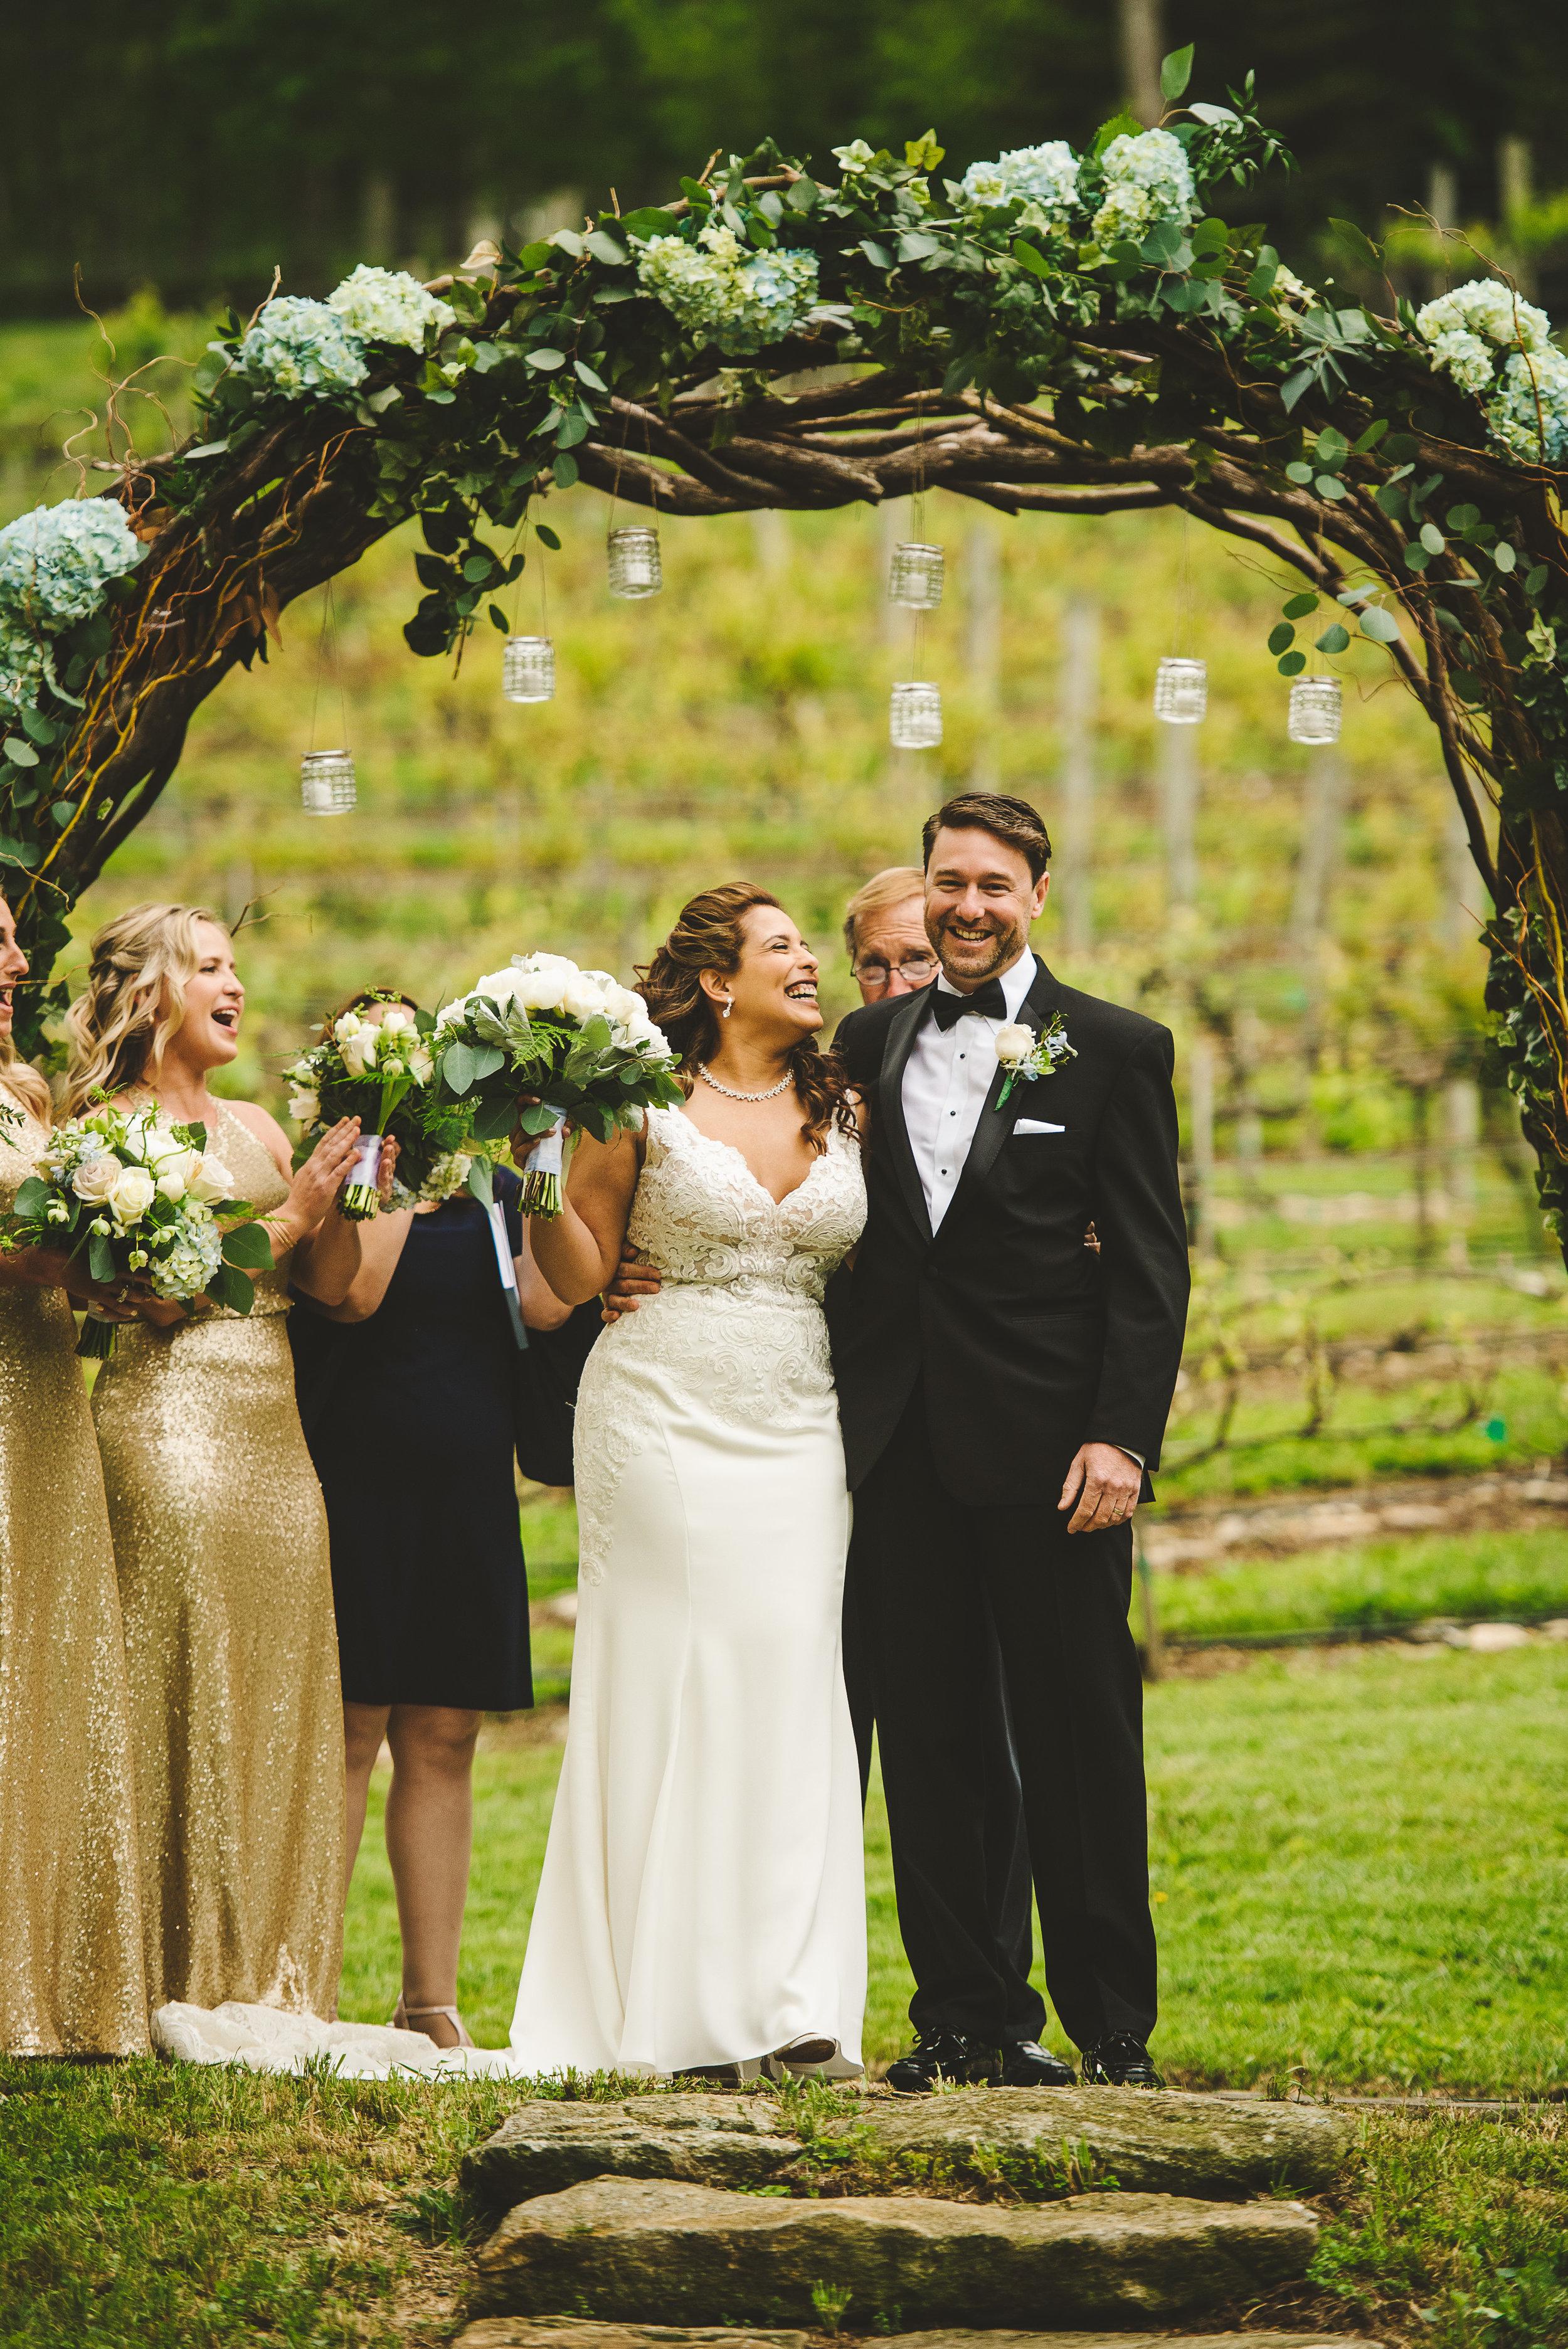 giovanna-richard-wedding-213.jpg